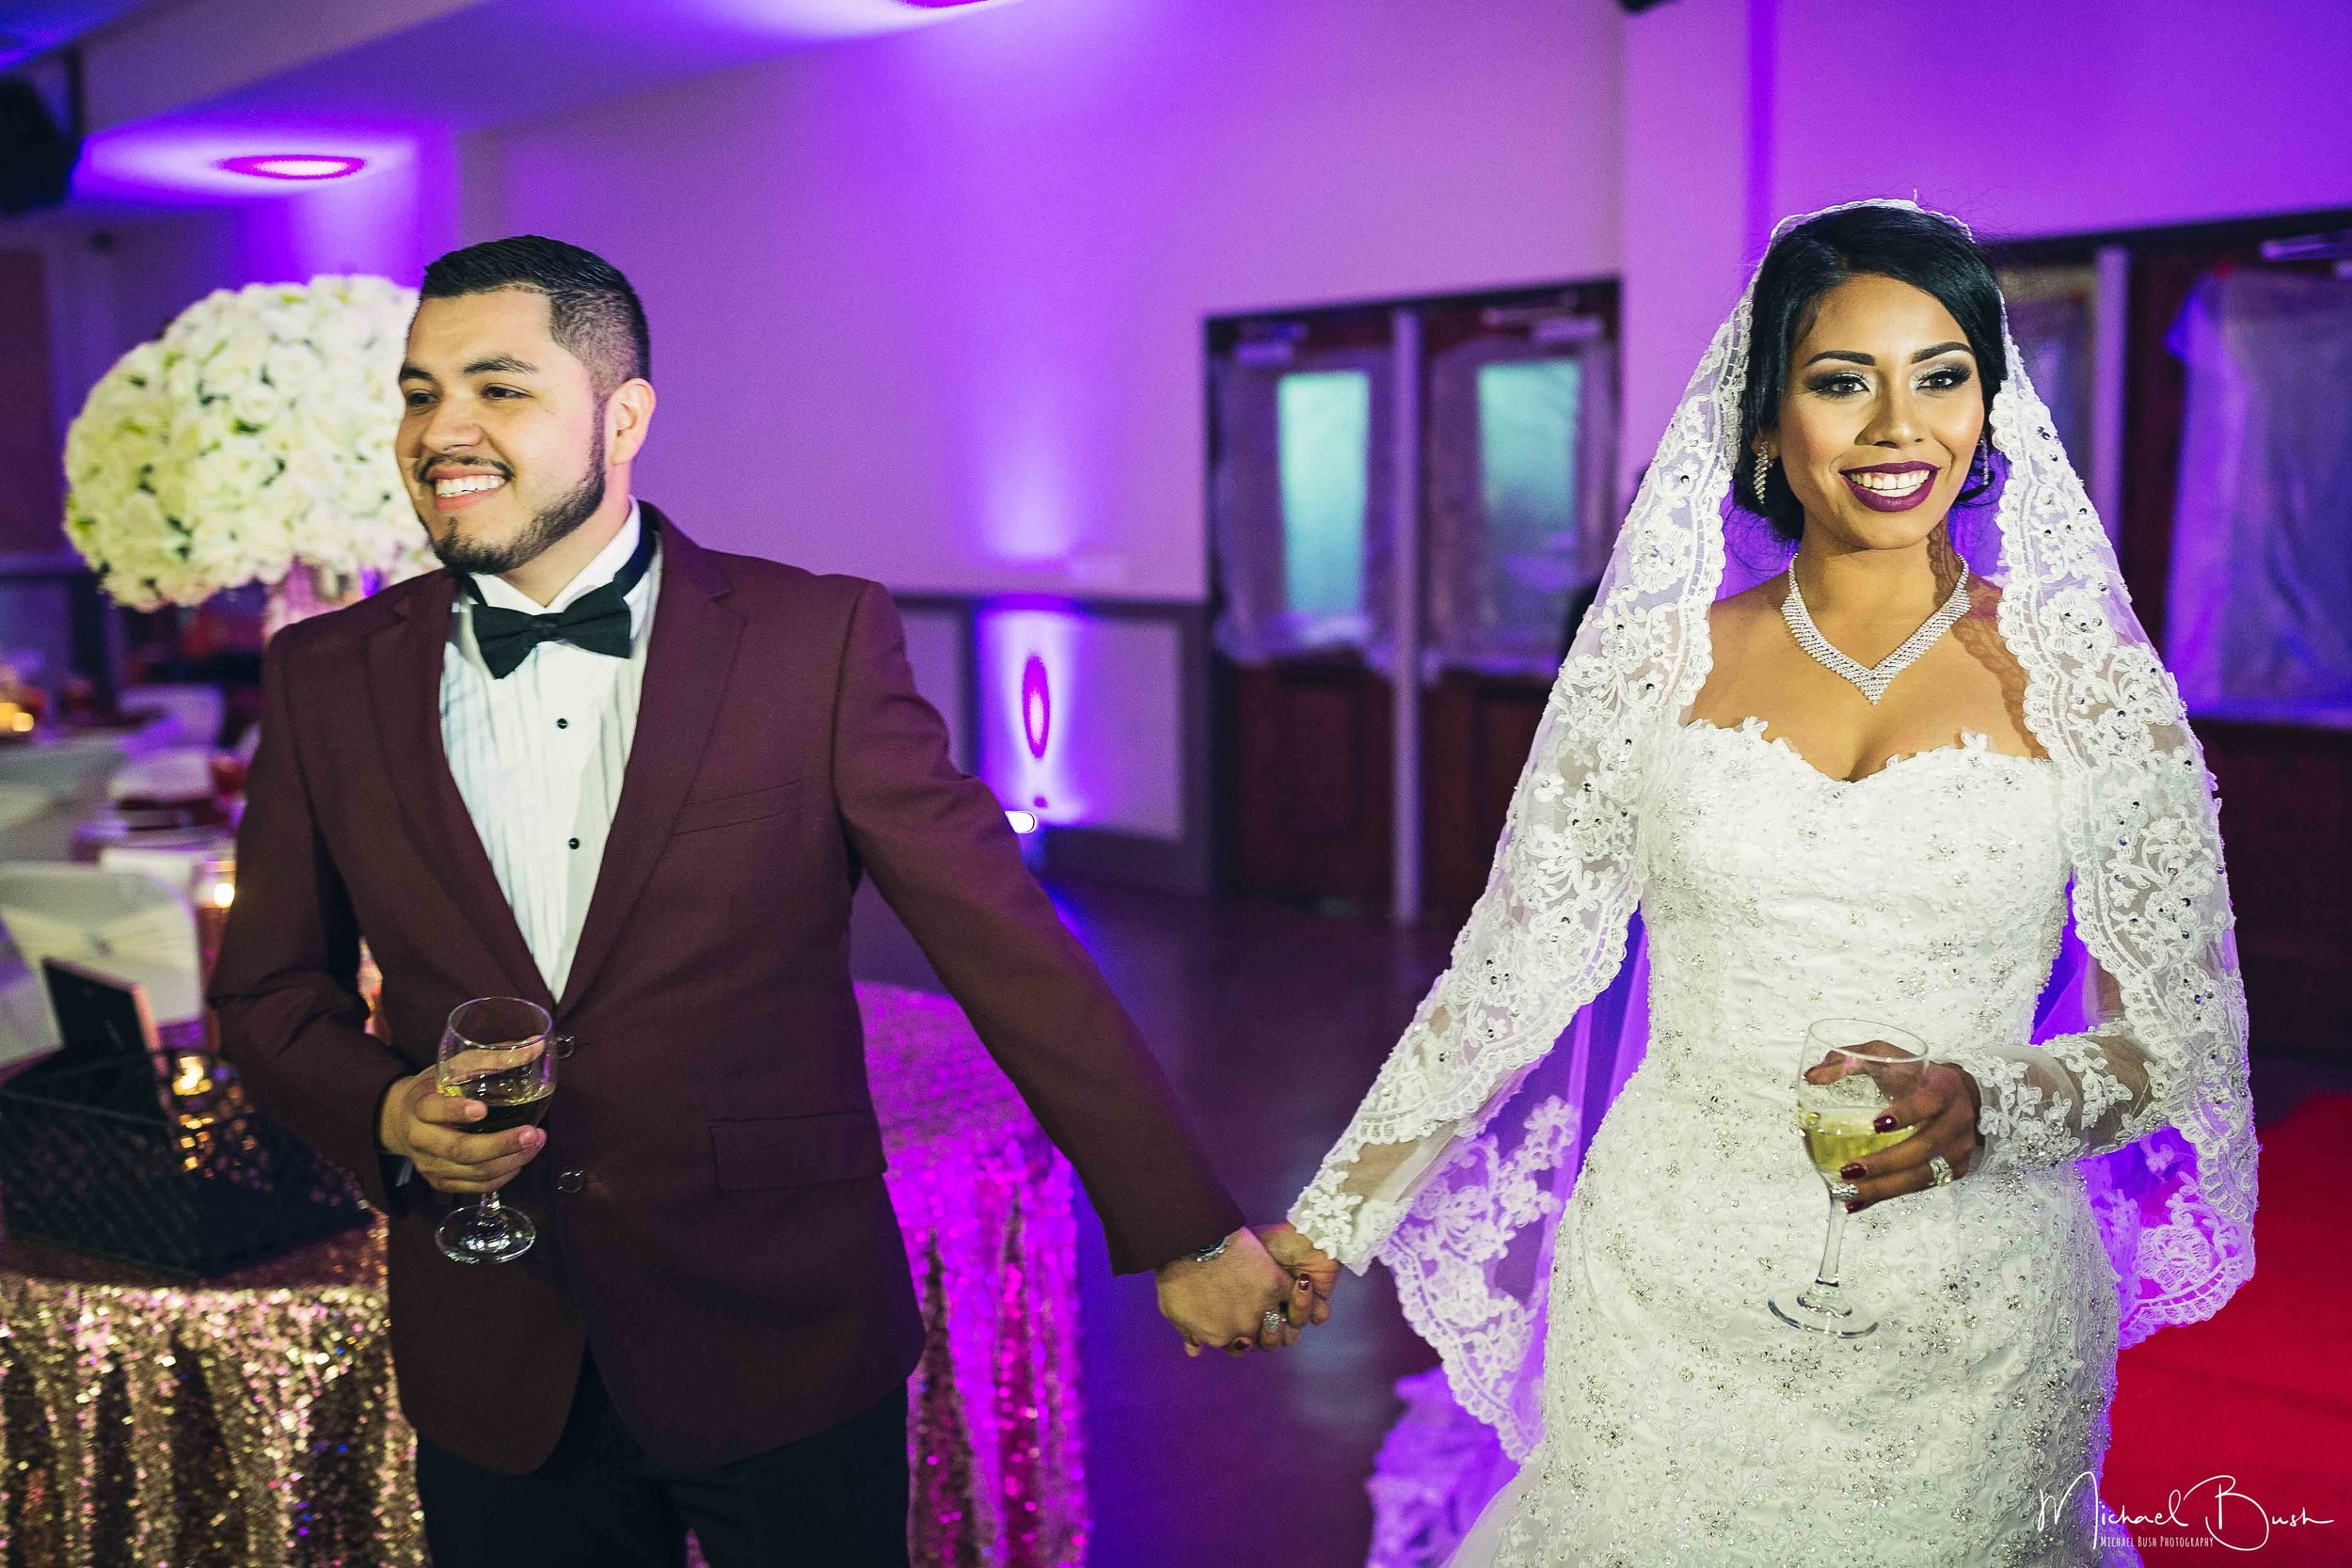 Wedding-Reception-Detials-Fort-Worth-Venue-Firstlook.jpg